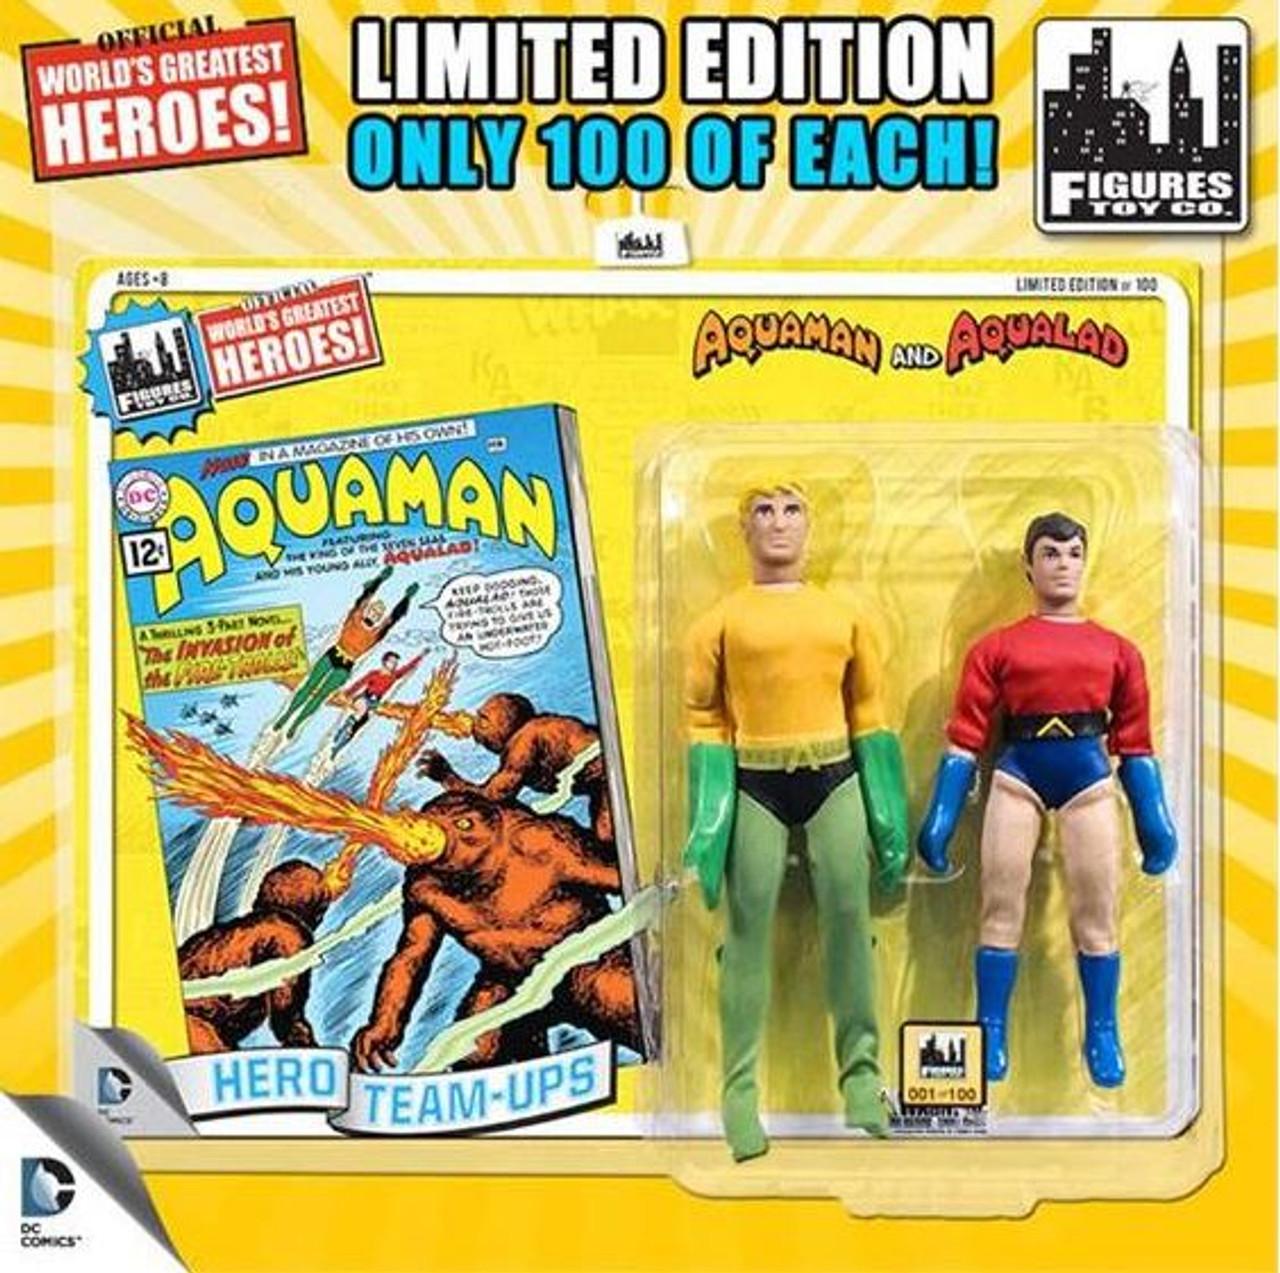 Aquaman Super Friends 8 Inch Retro Style Figures Universe of Evil Edition